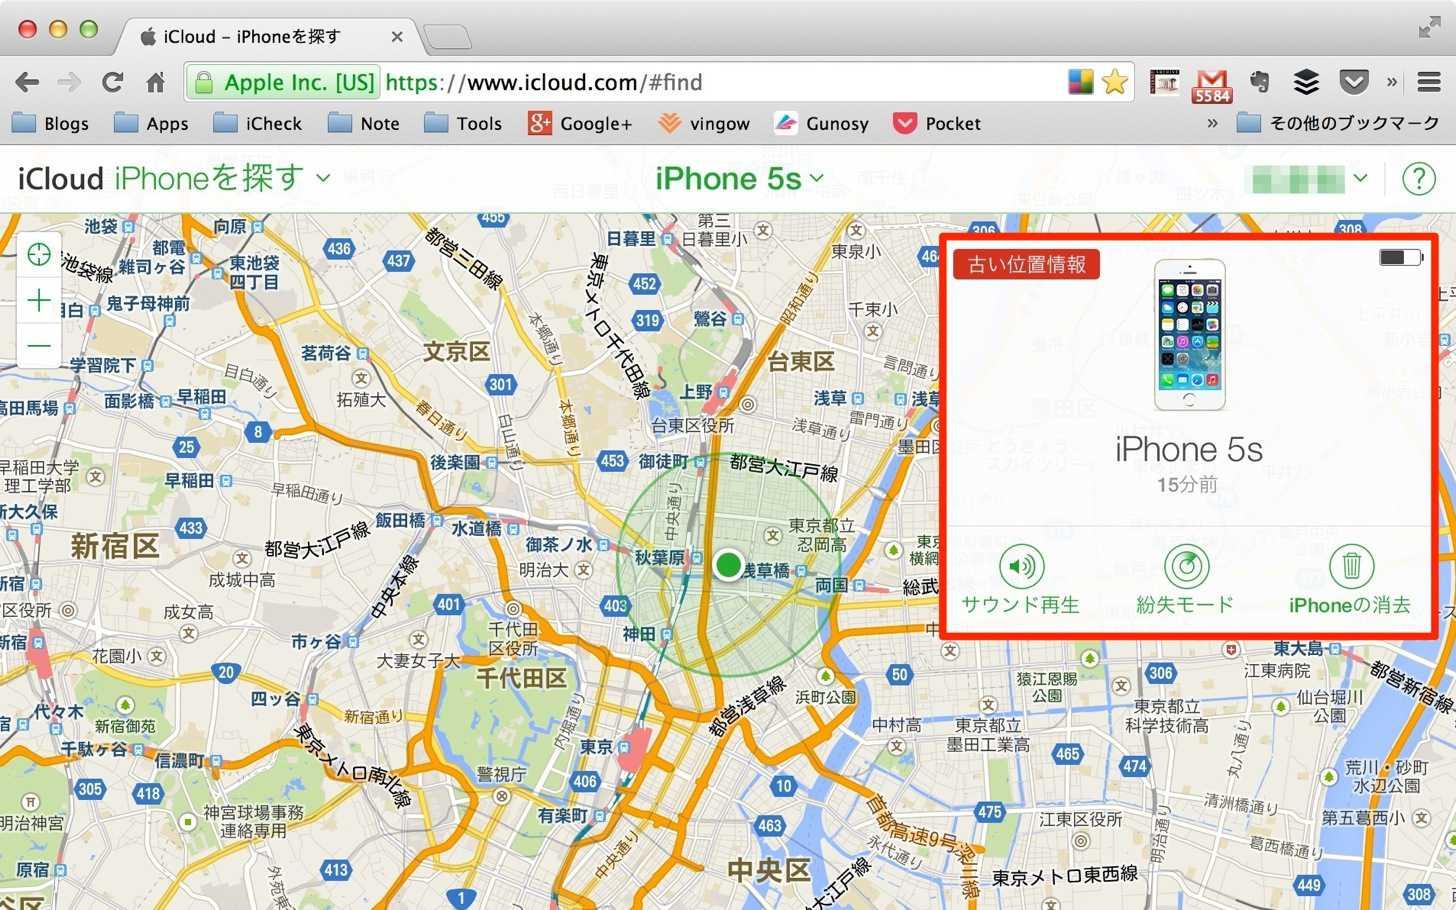 iPhoneをiCloudから遠隔操作できる